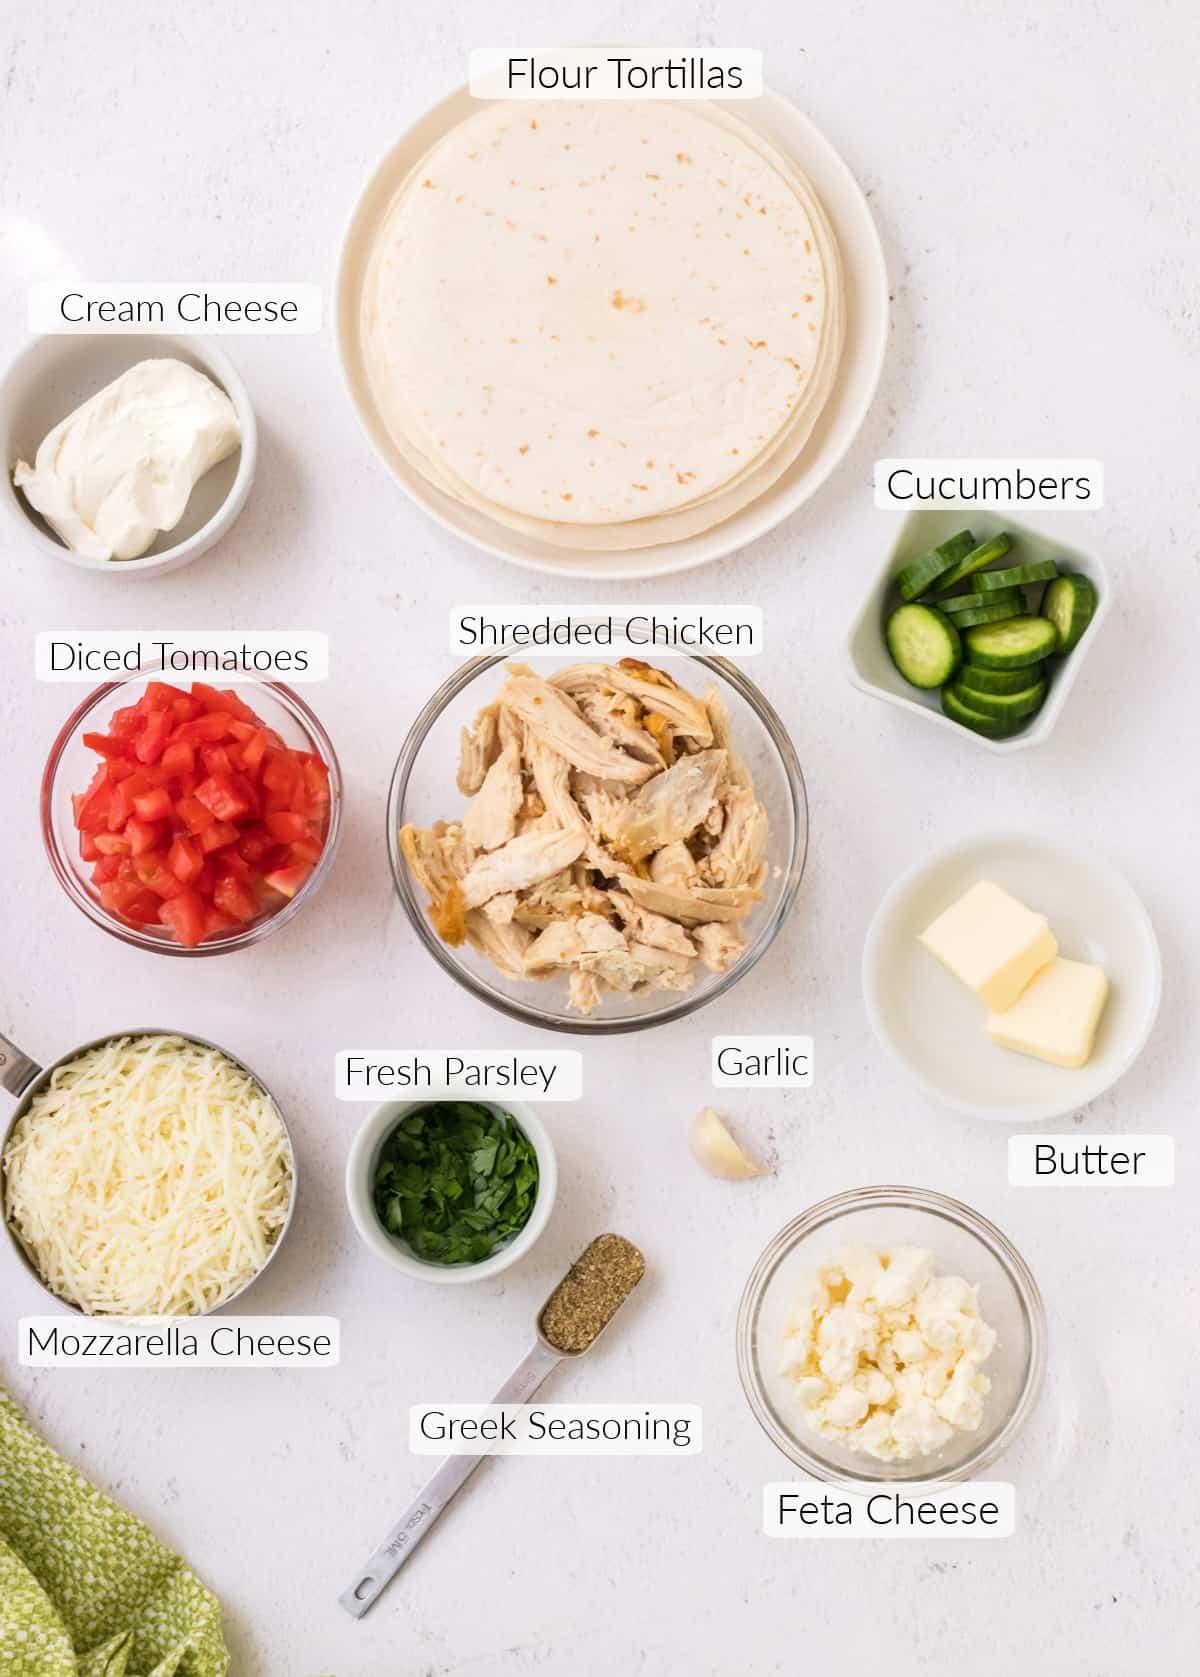 Labeled ingredients in bowls to make Greek quesadillas.